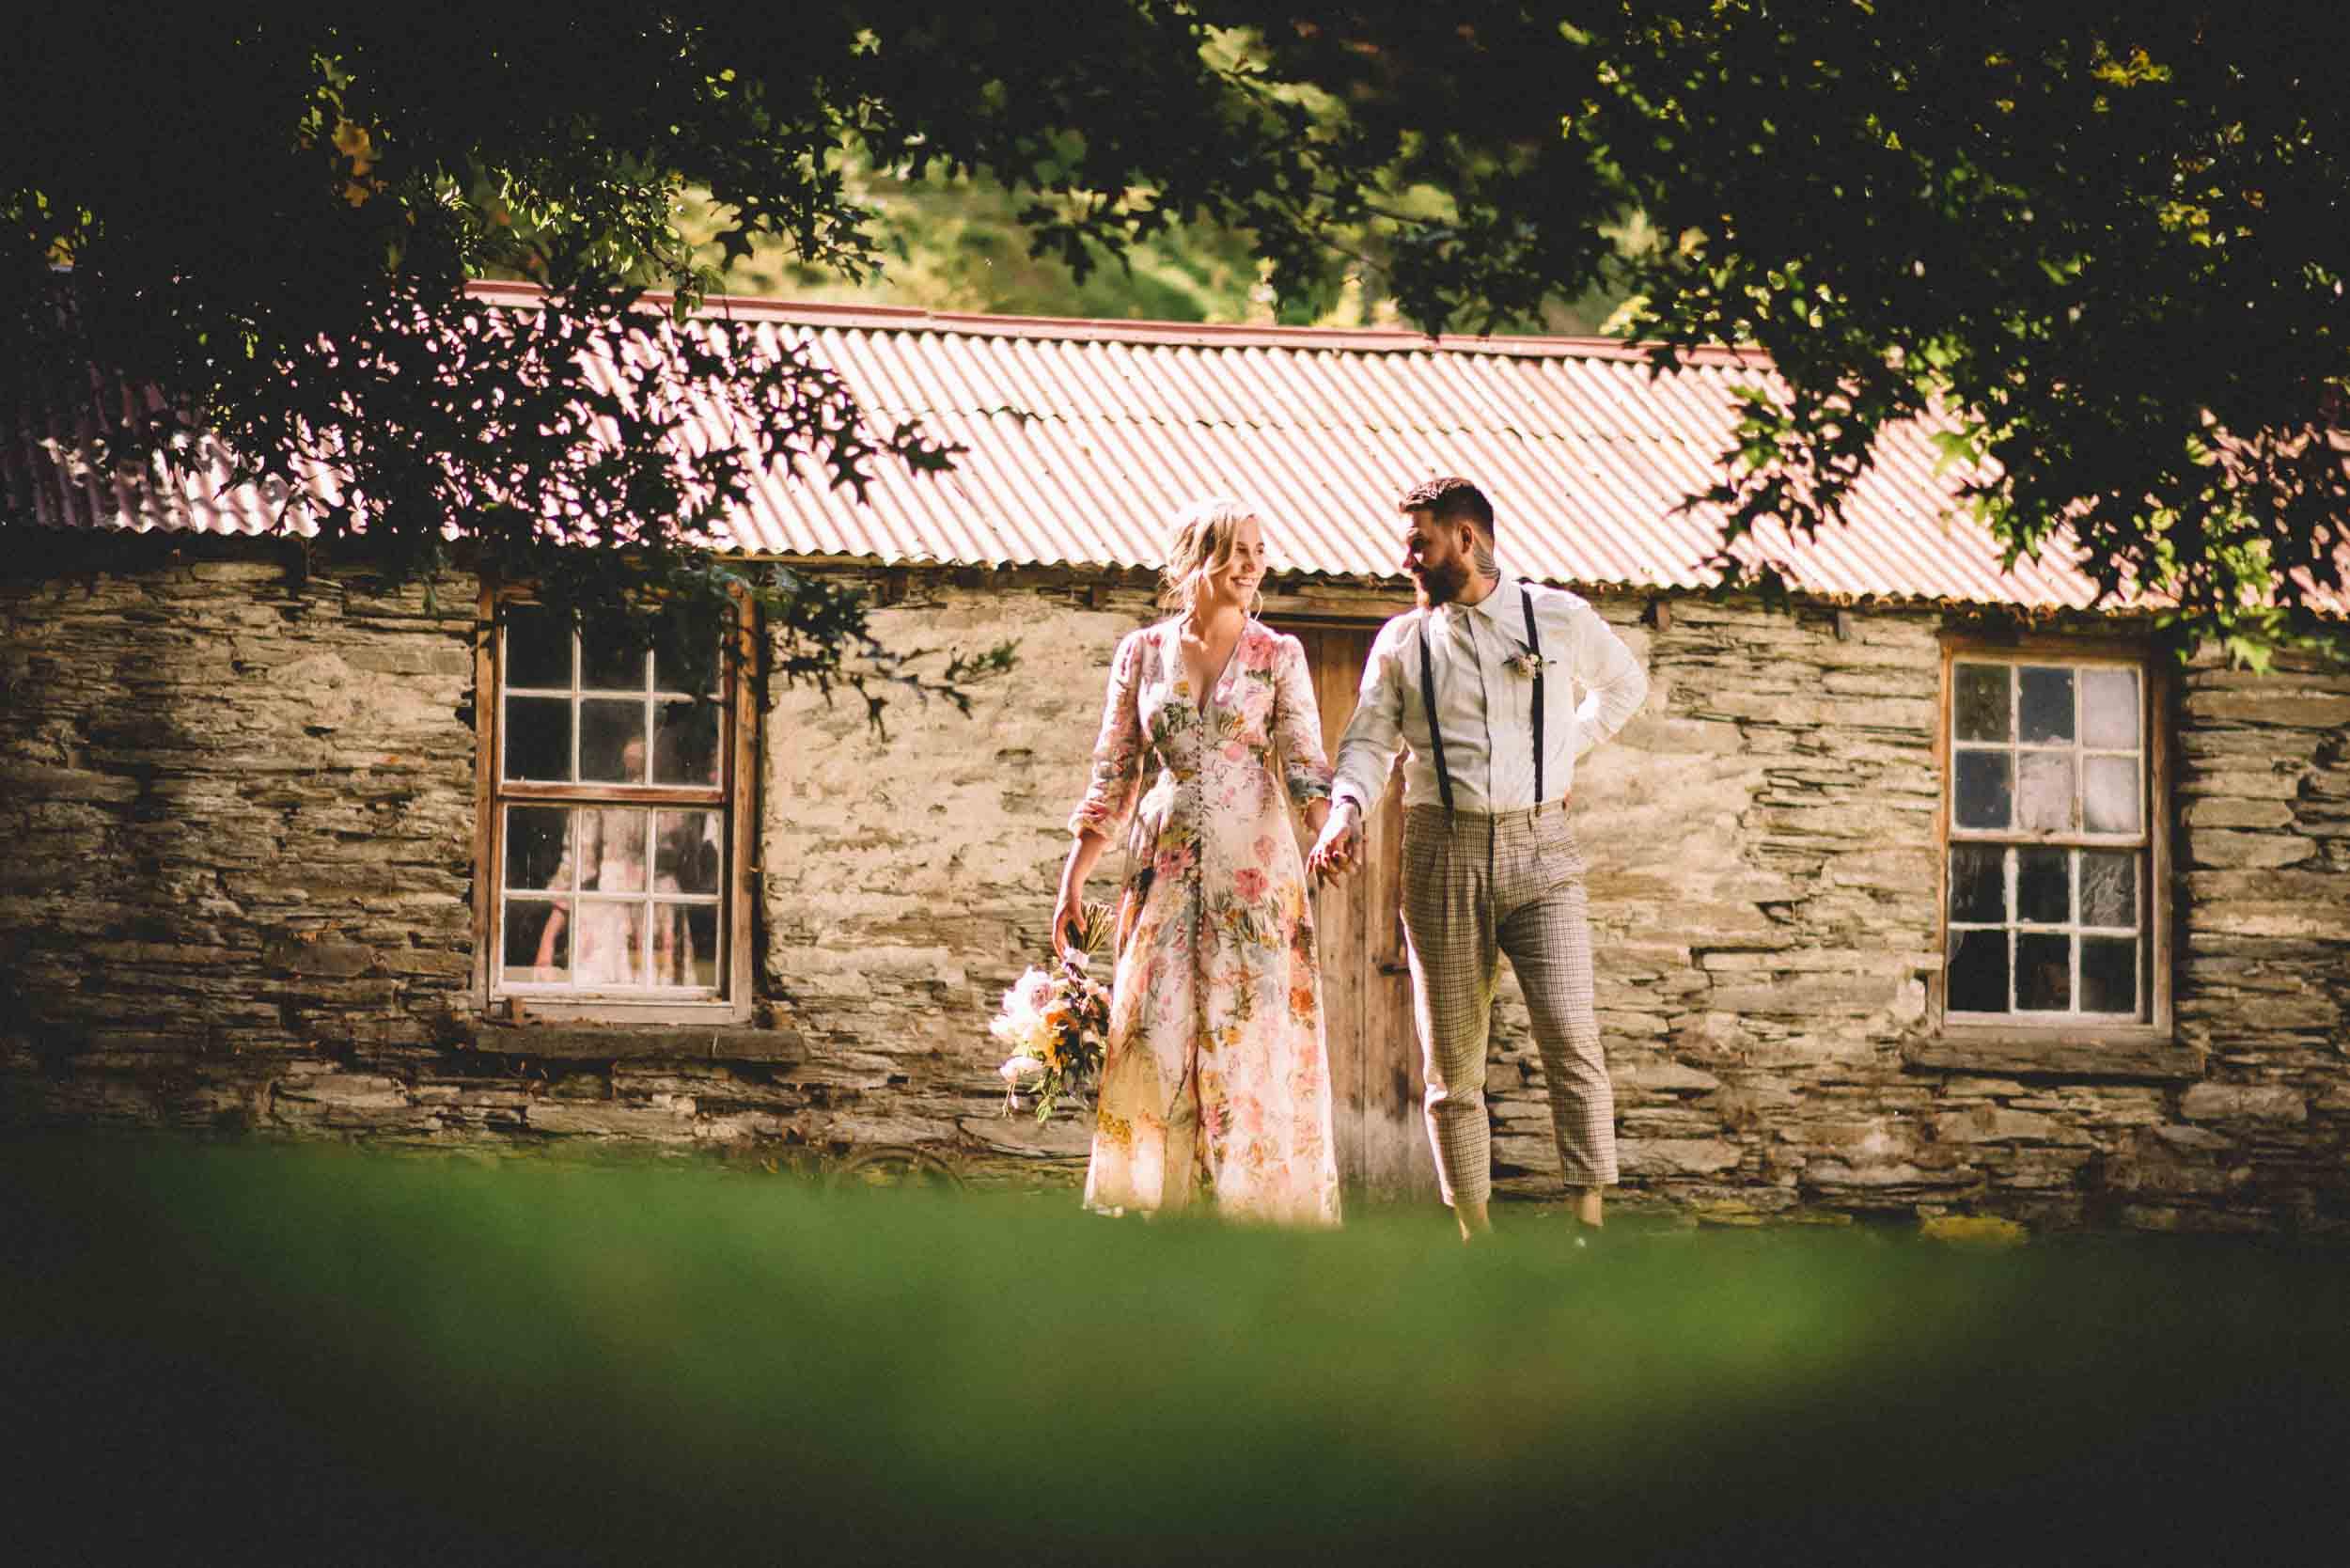 Nick & Nina's Thurlby Domain Elopement bride & groom photos tree old stone cottage